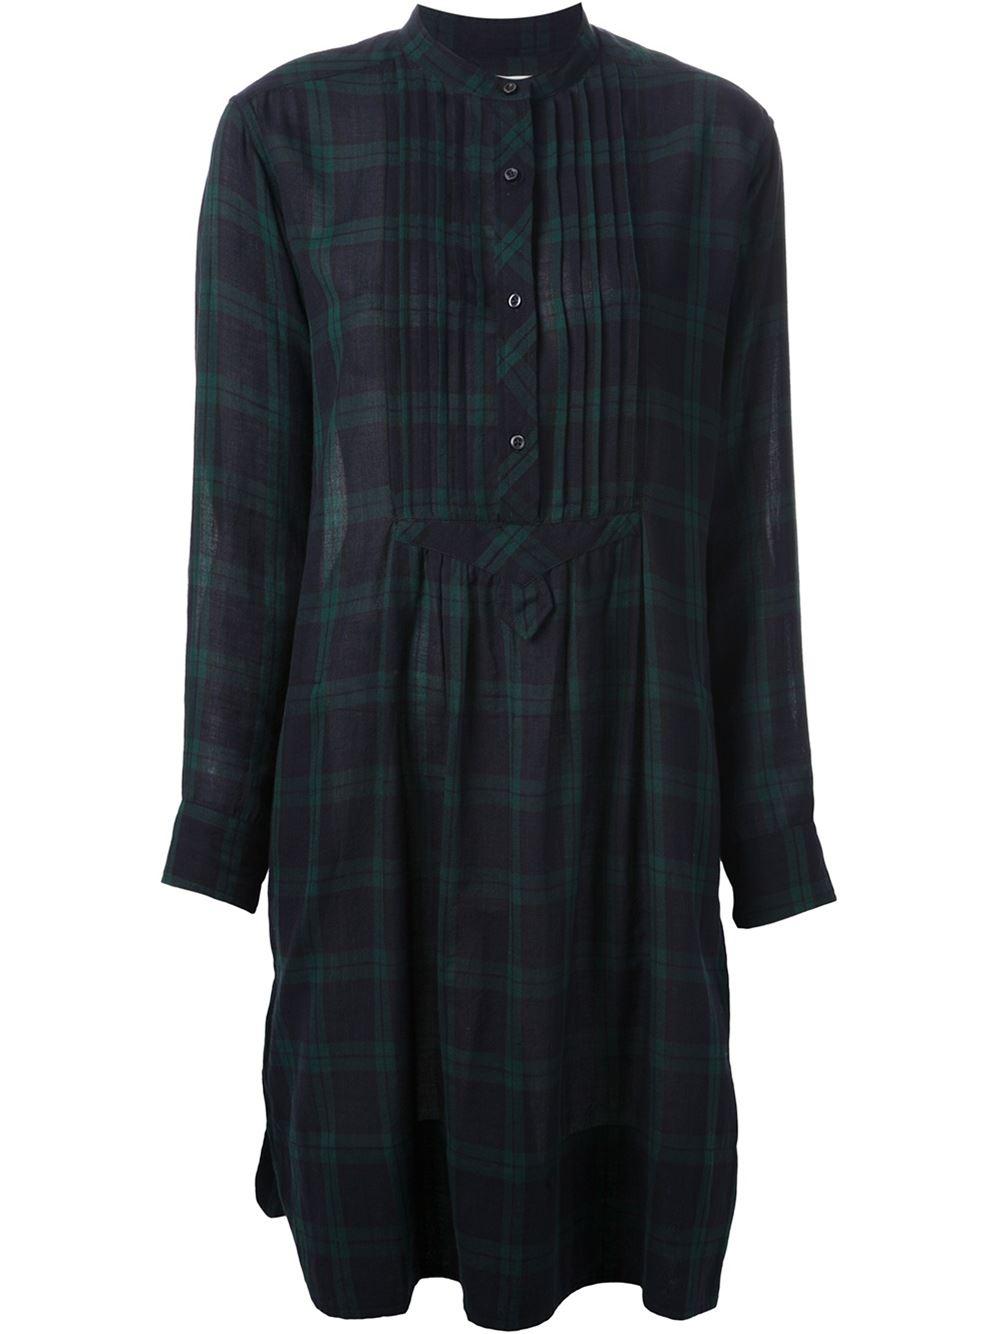 Toile isabel marant ilaria shirt dress in green lyst for Isabel marant shirt dress